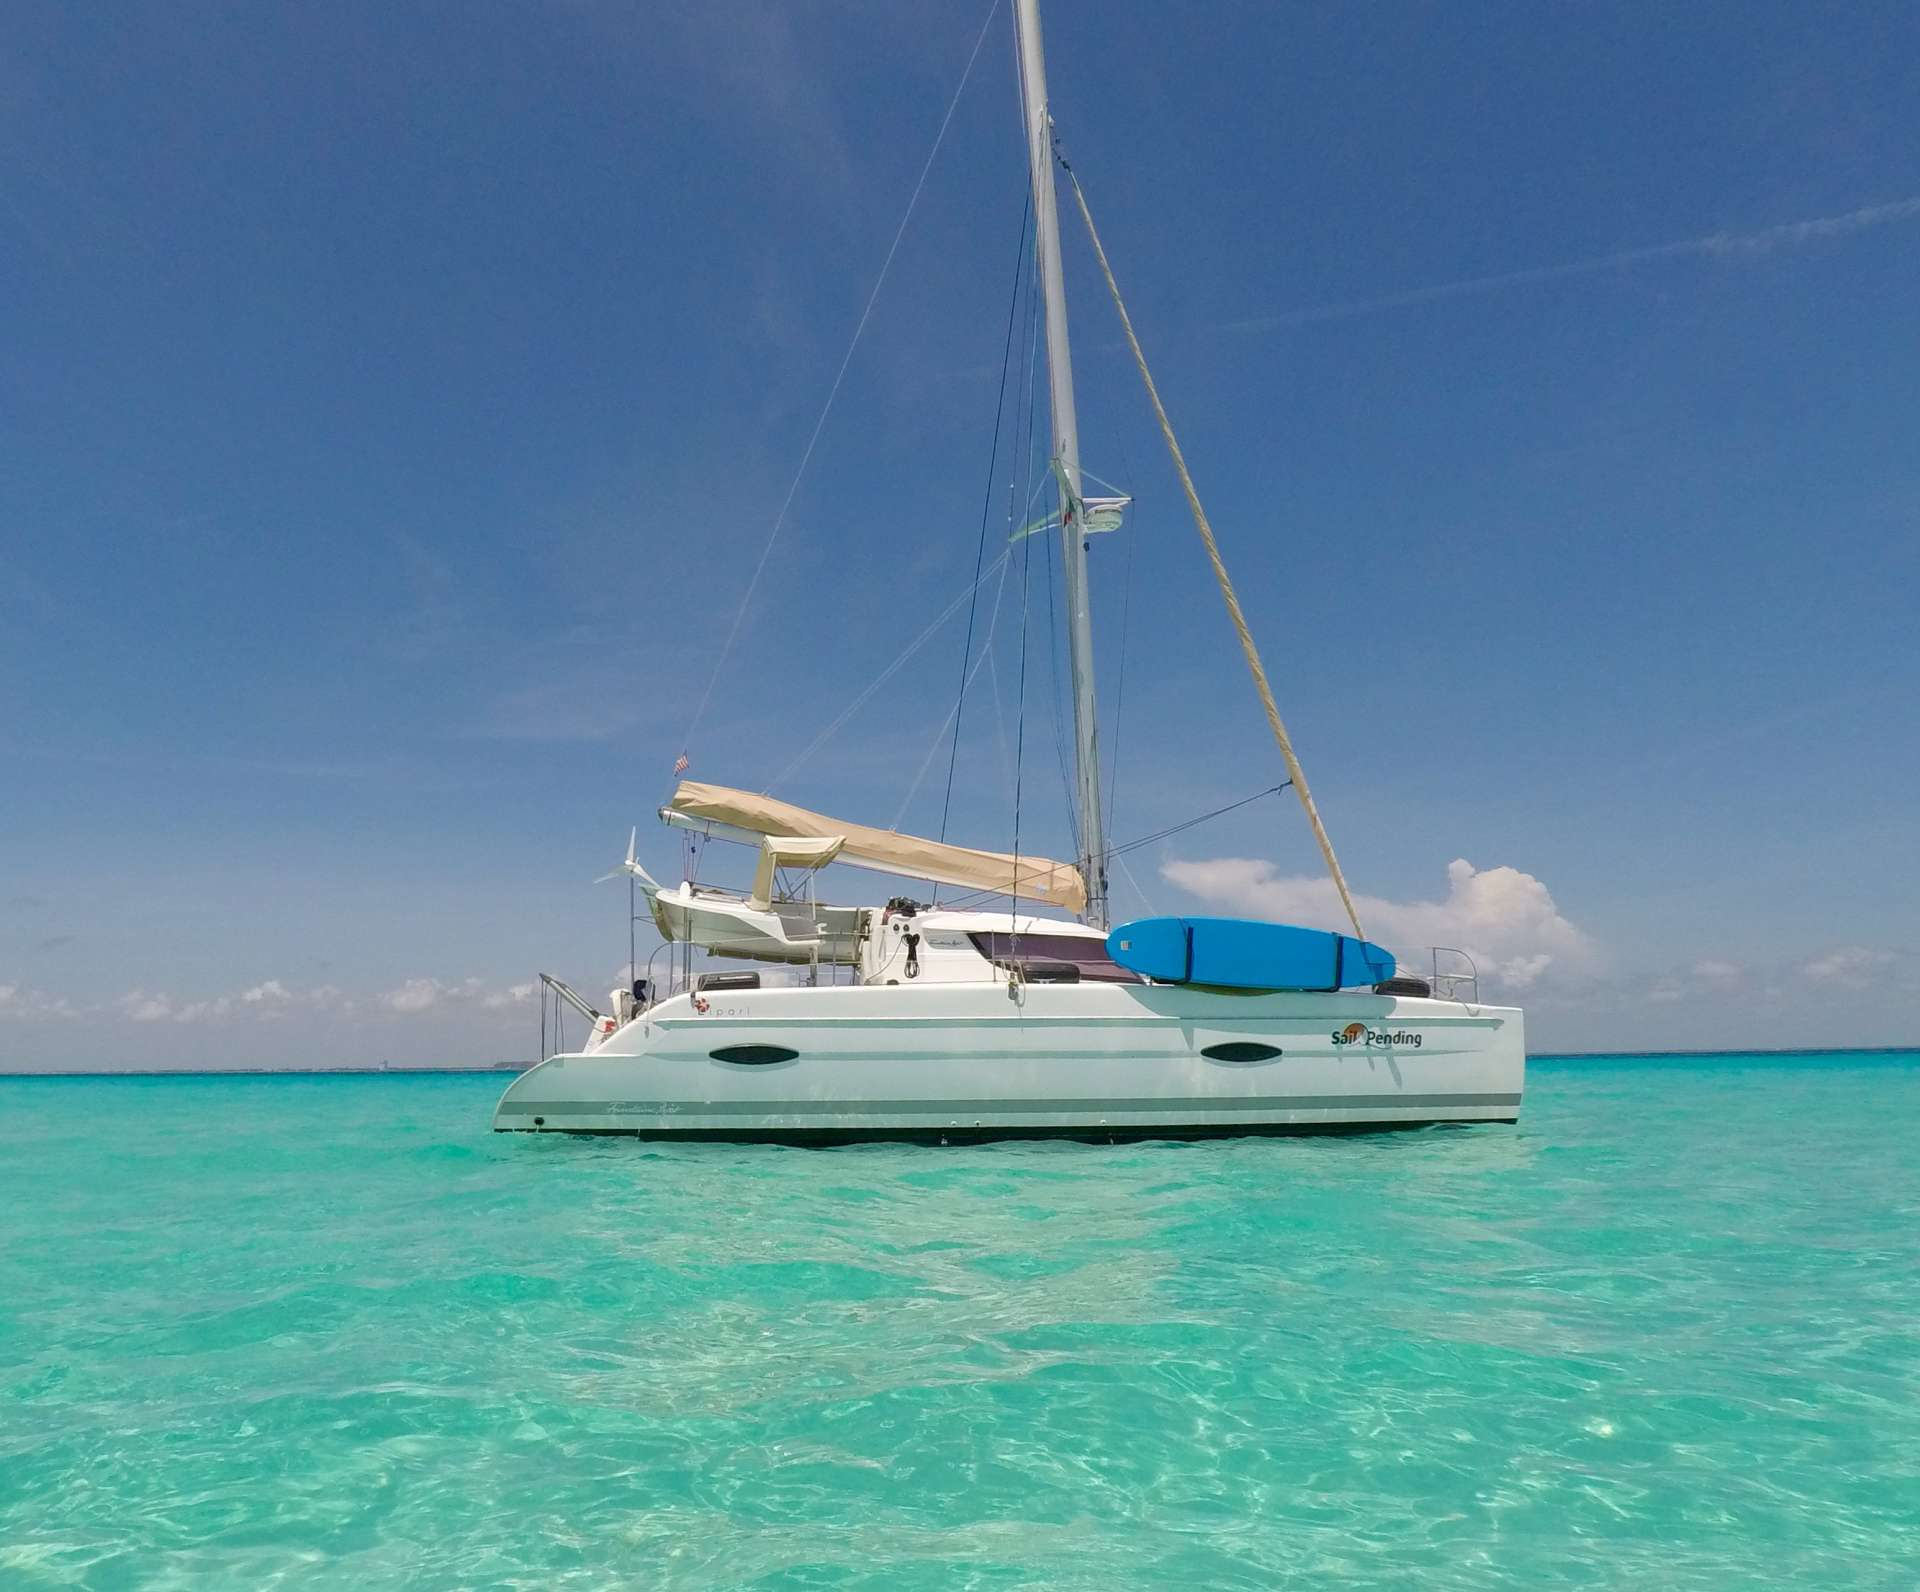 SAIL PENDING yacht image # 8